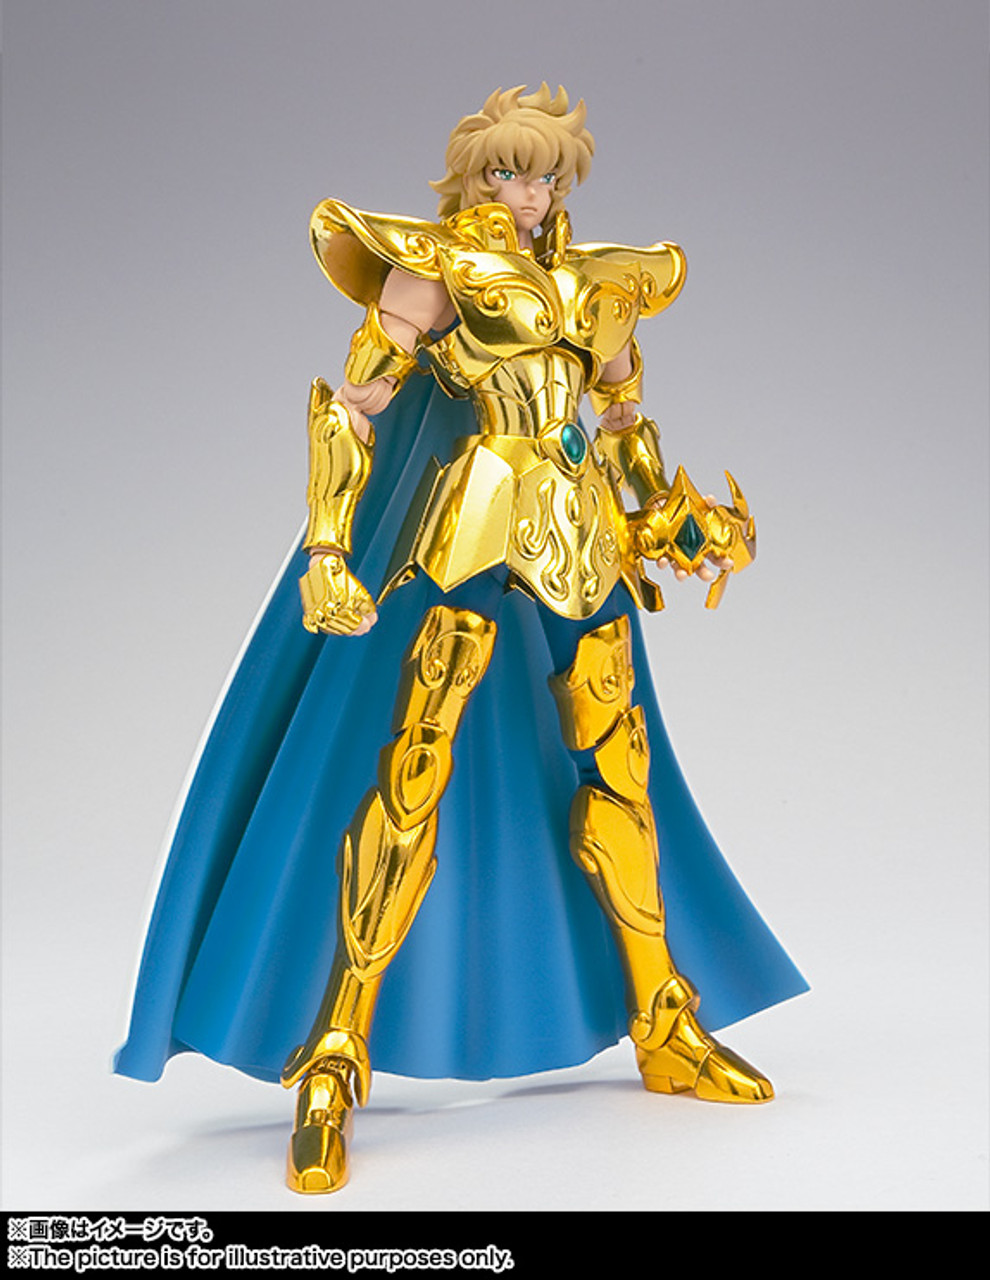 bandai saint seiya DD D.D.Panoramation LEO AIOLIA gold cloth action figurine